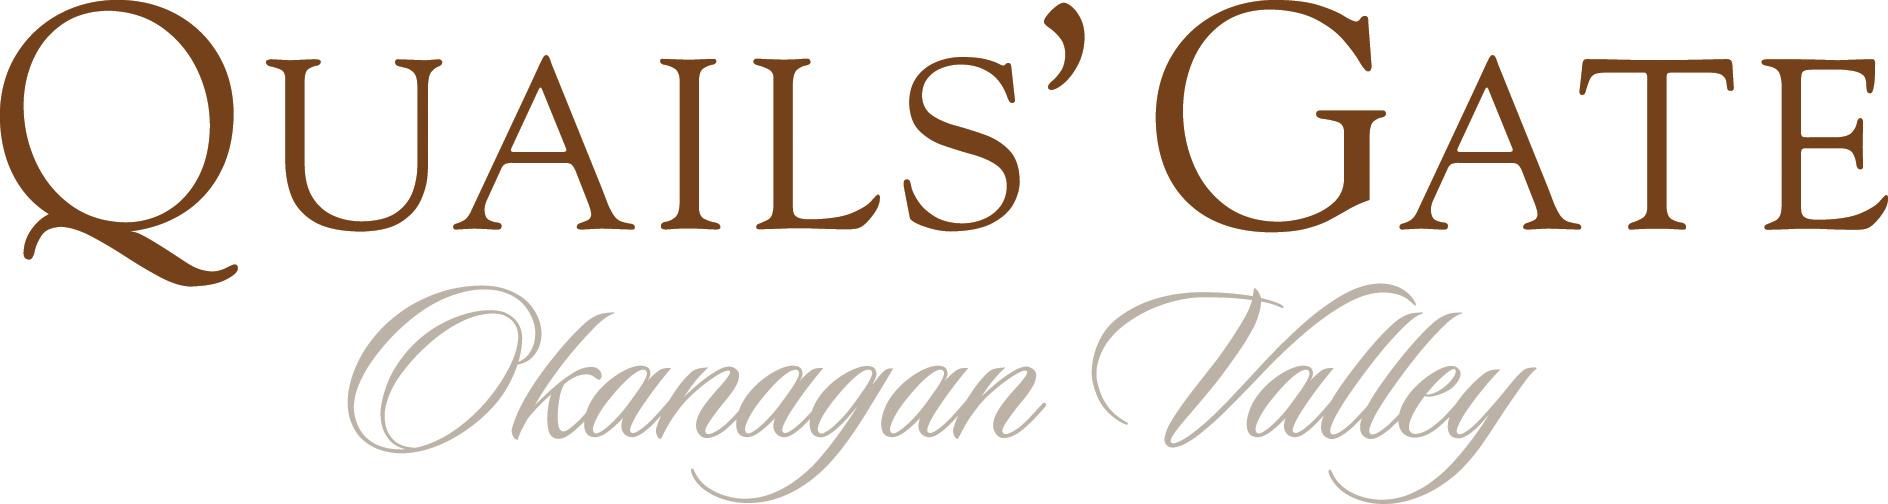 Quails' Gate Vineyards Estate Winery